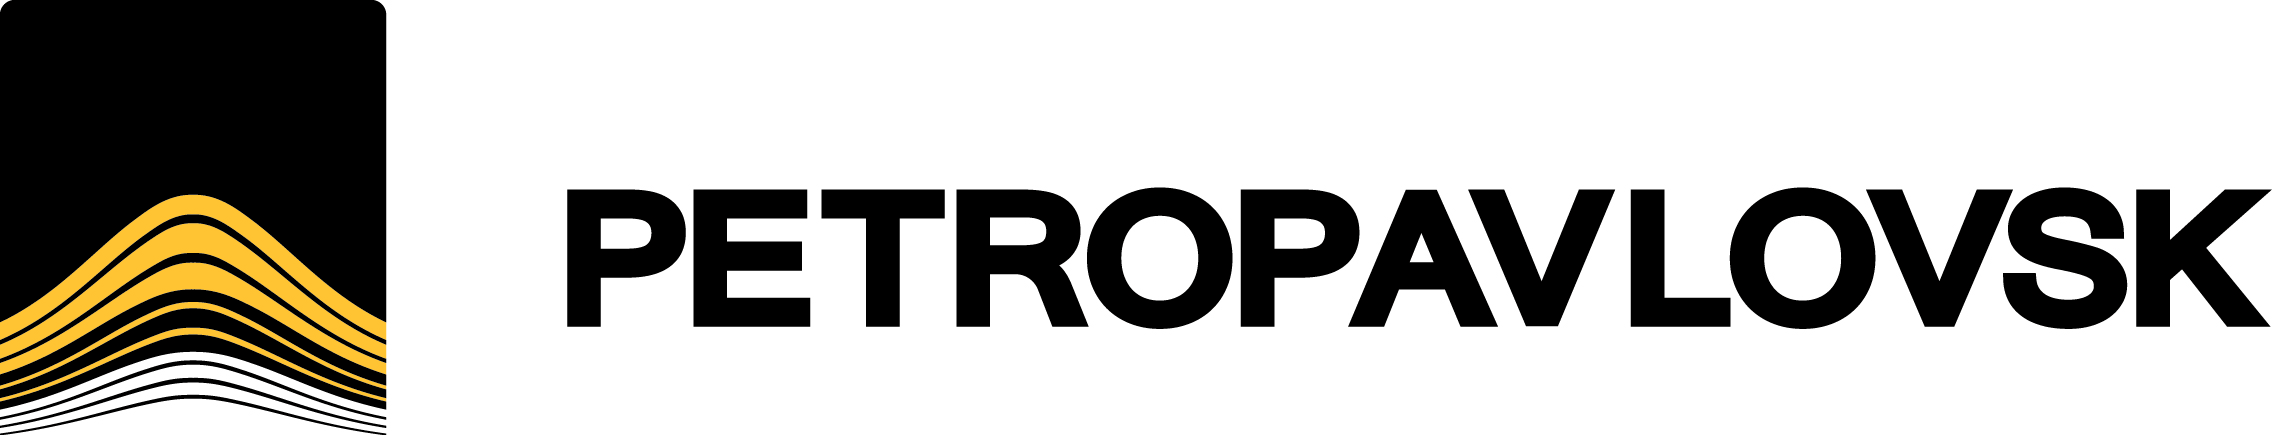 Petropavlovsk Plc Logo